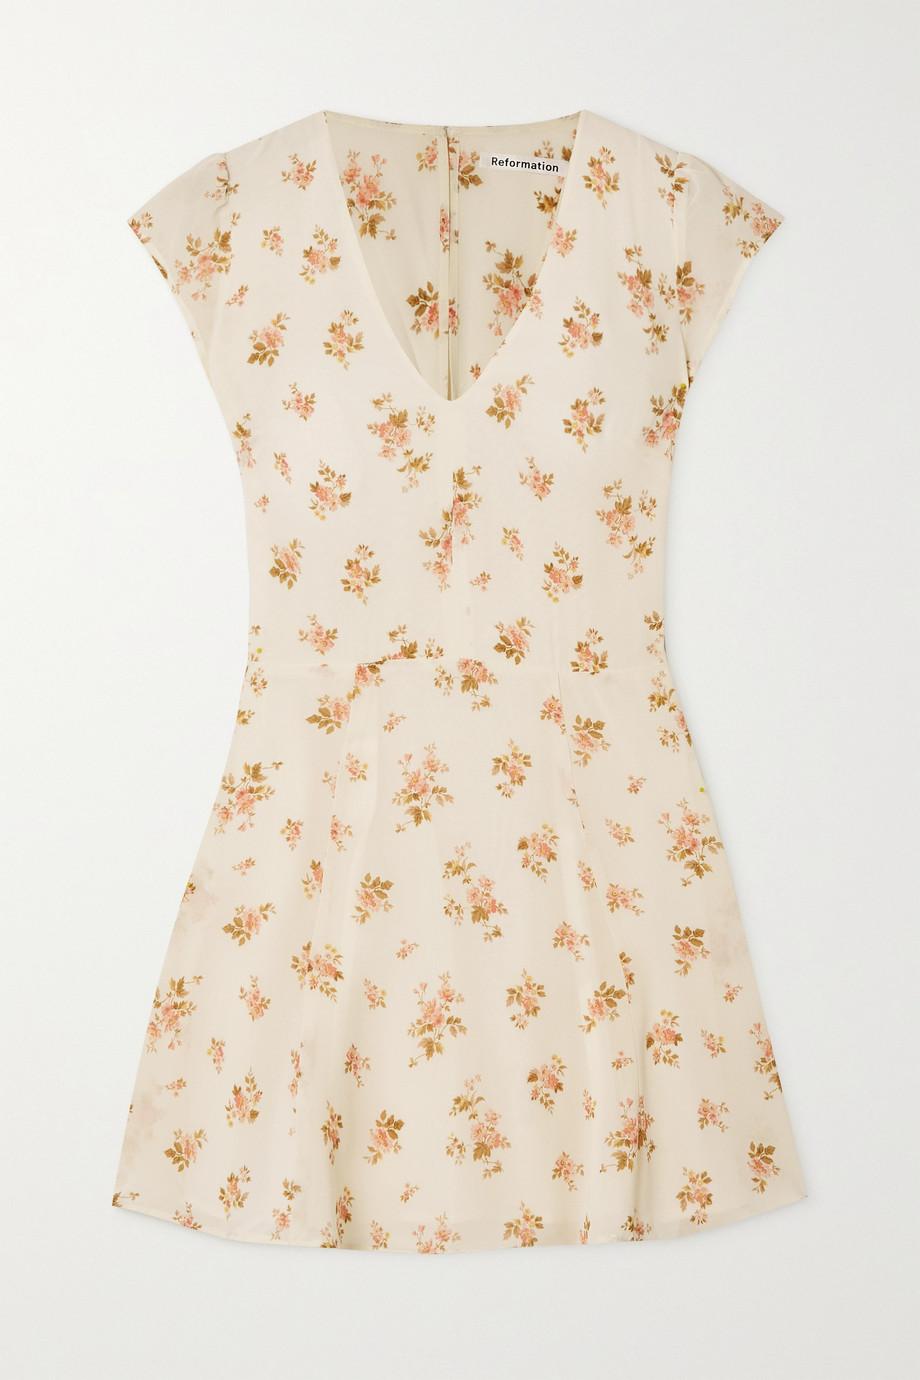 Reformation + NET SUSTAIN Deven floral-print georgette mini dress